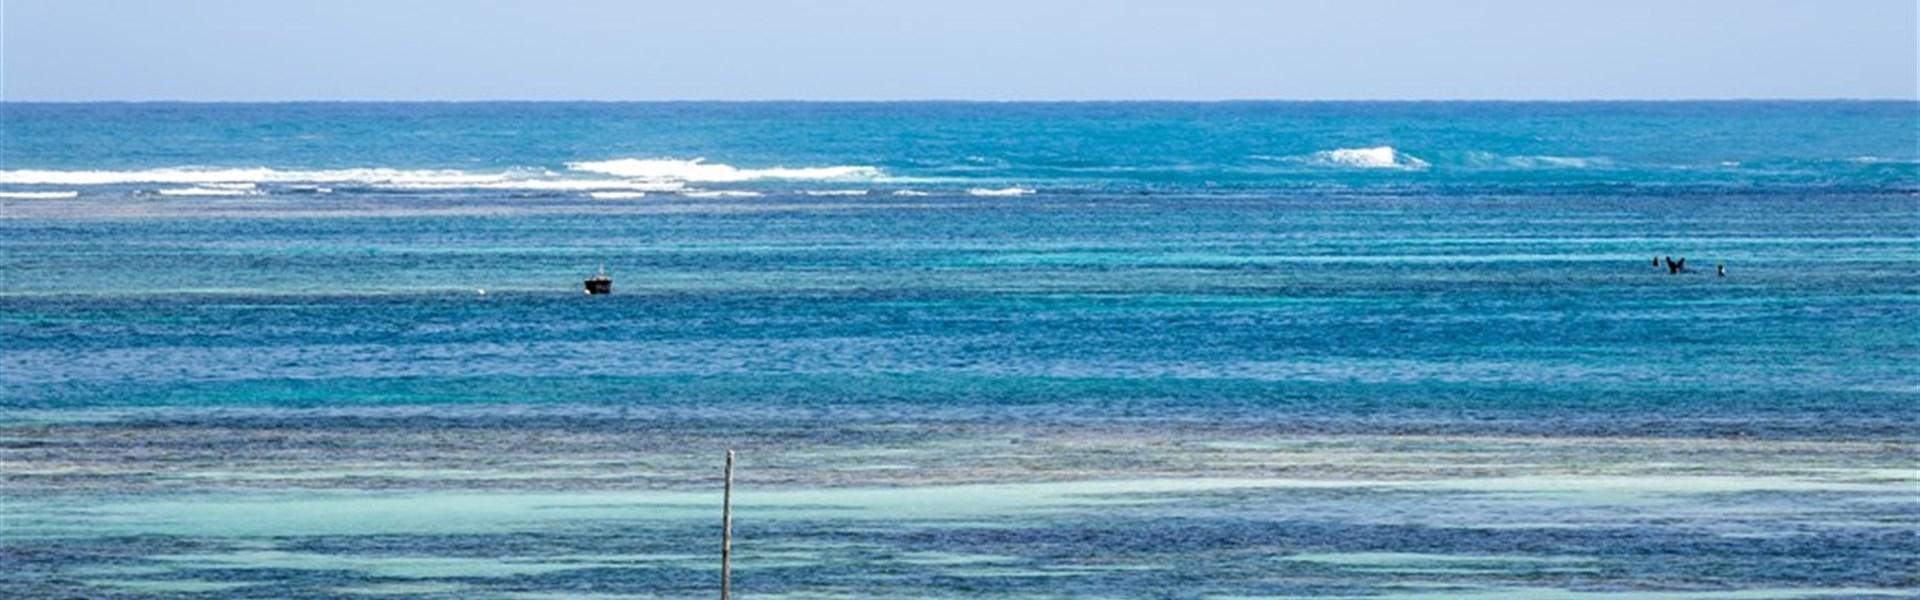 Last Moment - pobyt u moře v Keni - Diani Sea Lodge - Pobyt u moře v Keni_Diani Beach